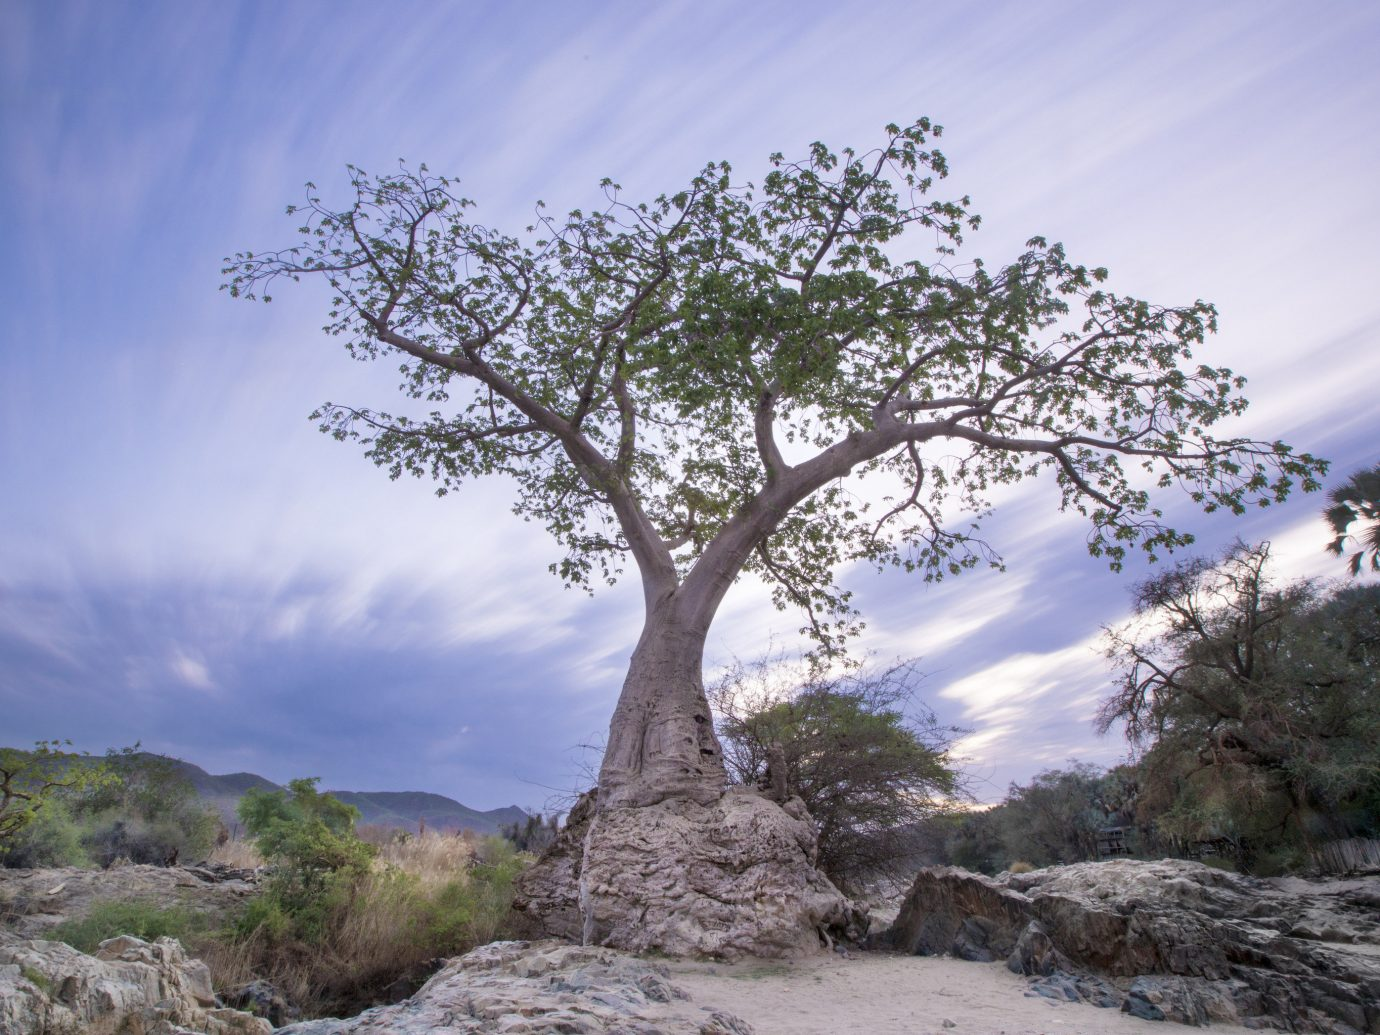 africa Honeymoon Namibia Romance Trip Ideas outdoor sky tree woody plant vegetation plant branch rock cloud mountain national park landscape shrubland formation hillside